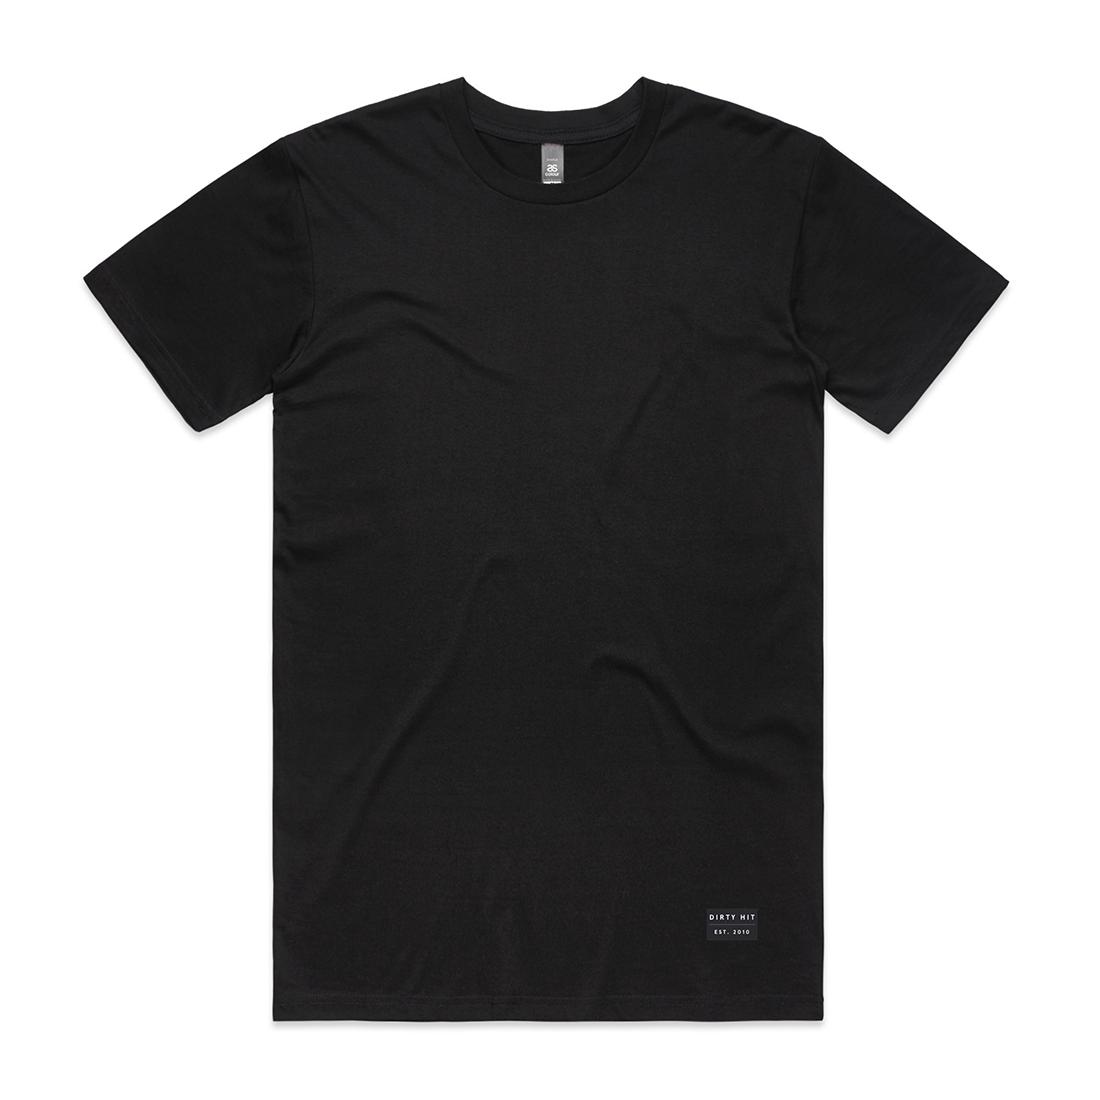 Dirty Hit: Ltd. Edition Patch Tee (Black)